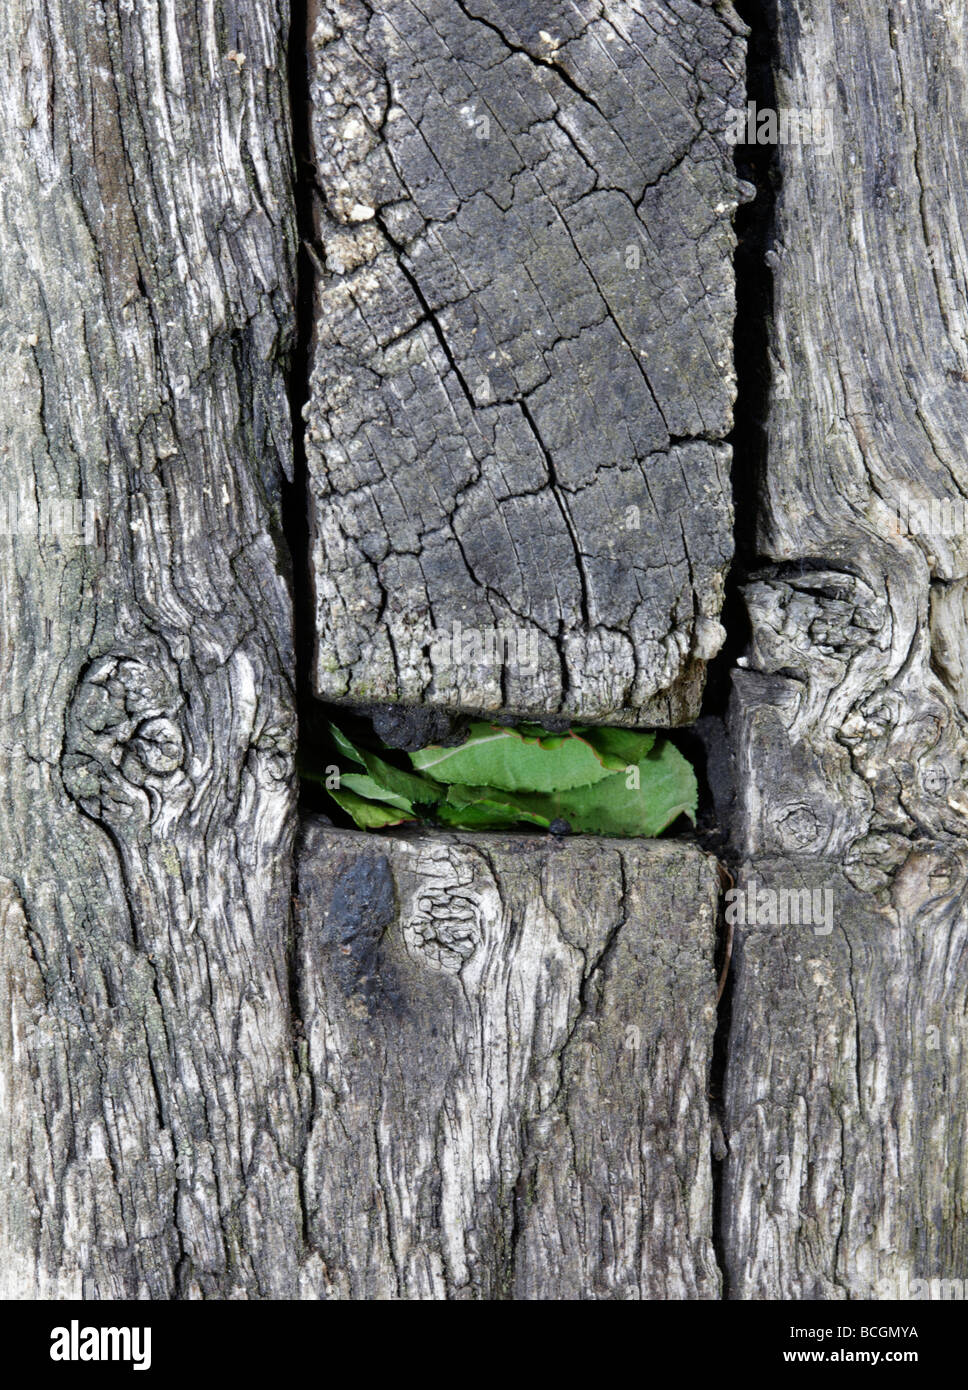 Megachile centuncularis nido de abeja cortadora de hojas selladas Imagen De Stock